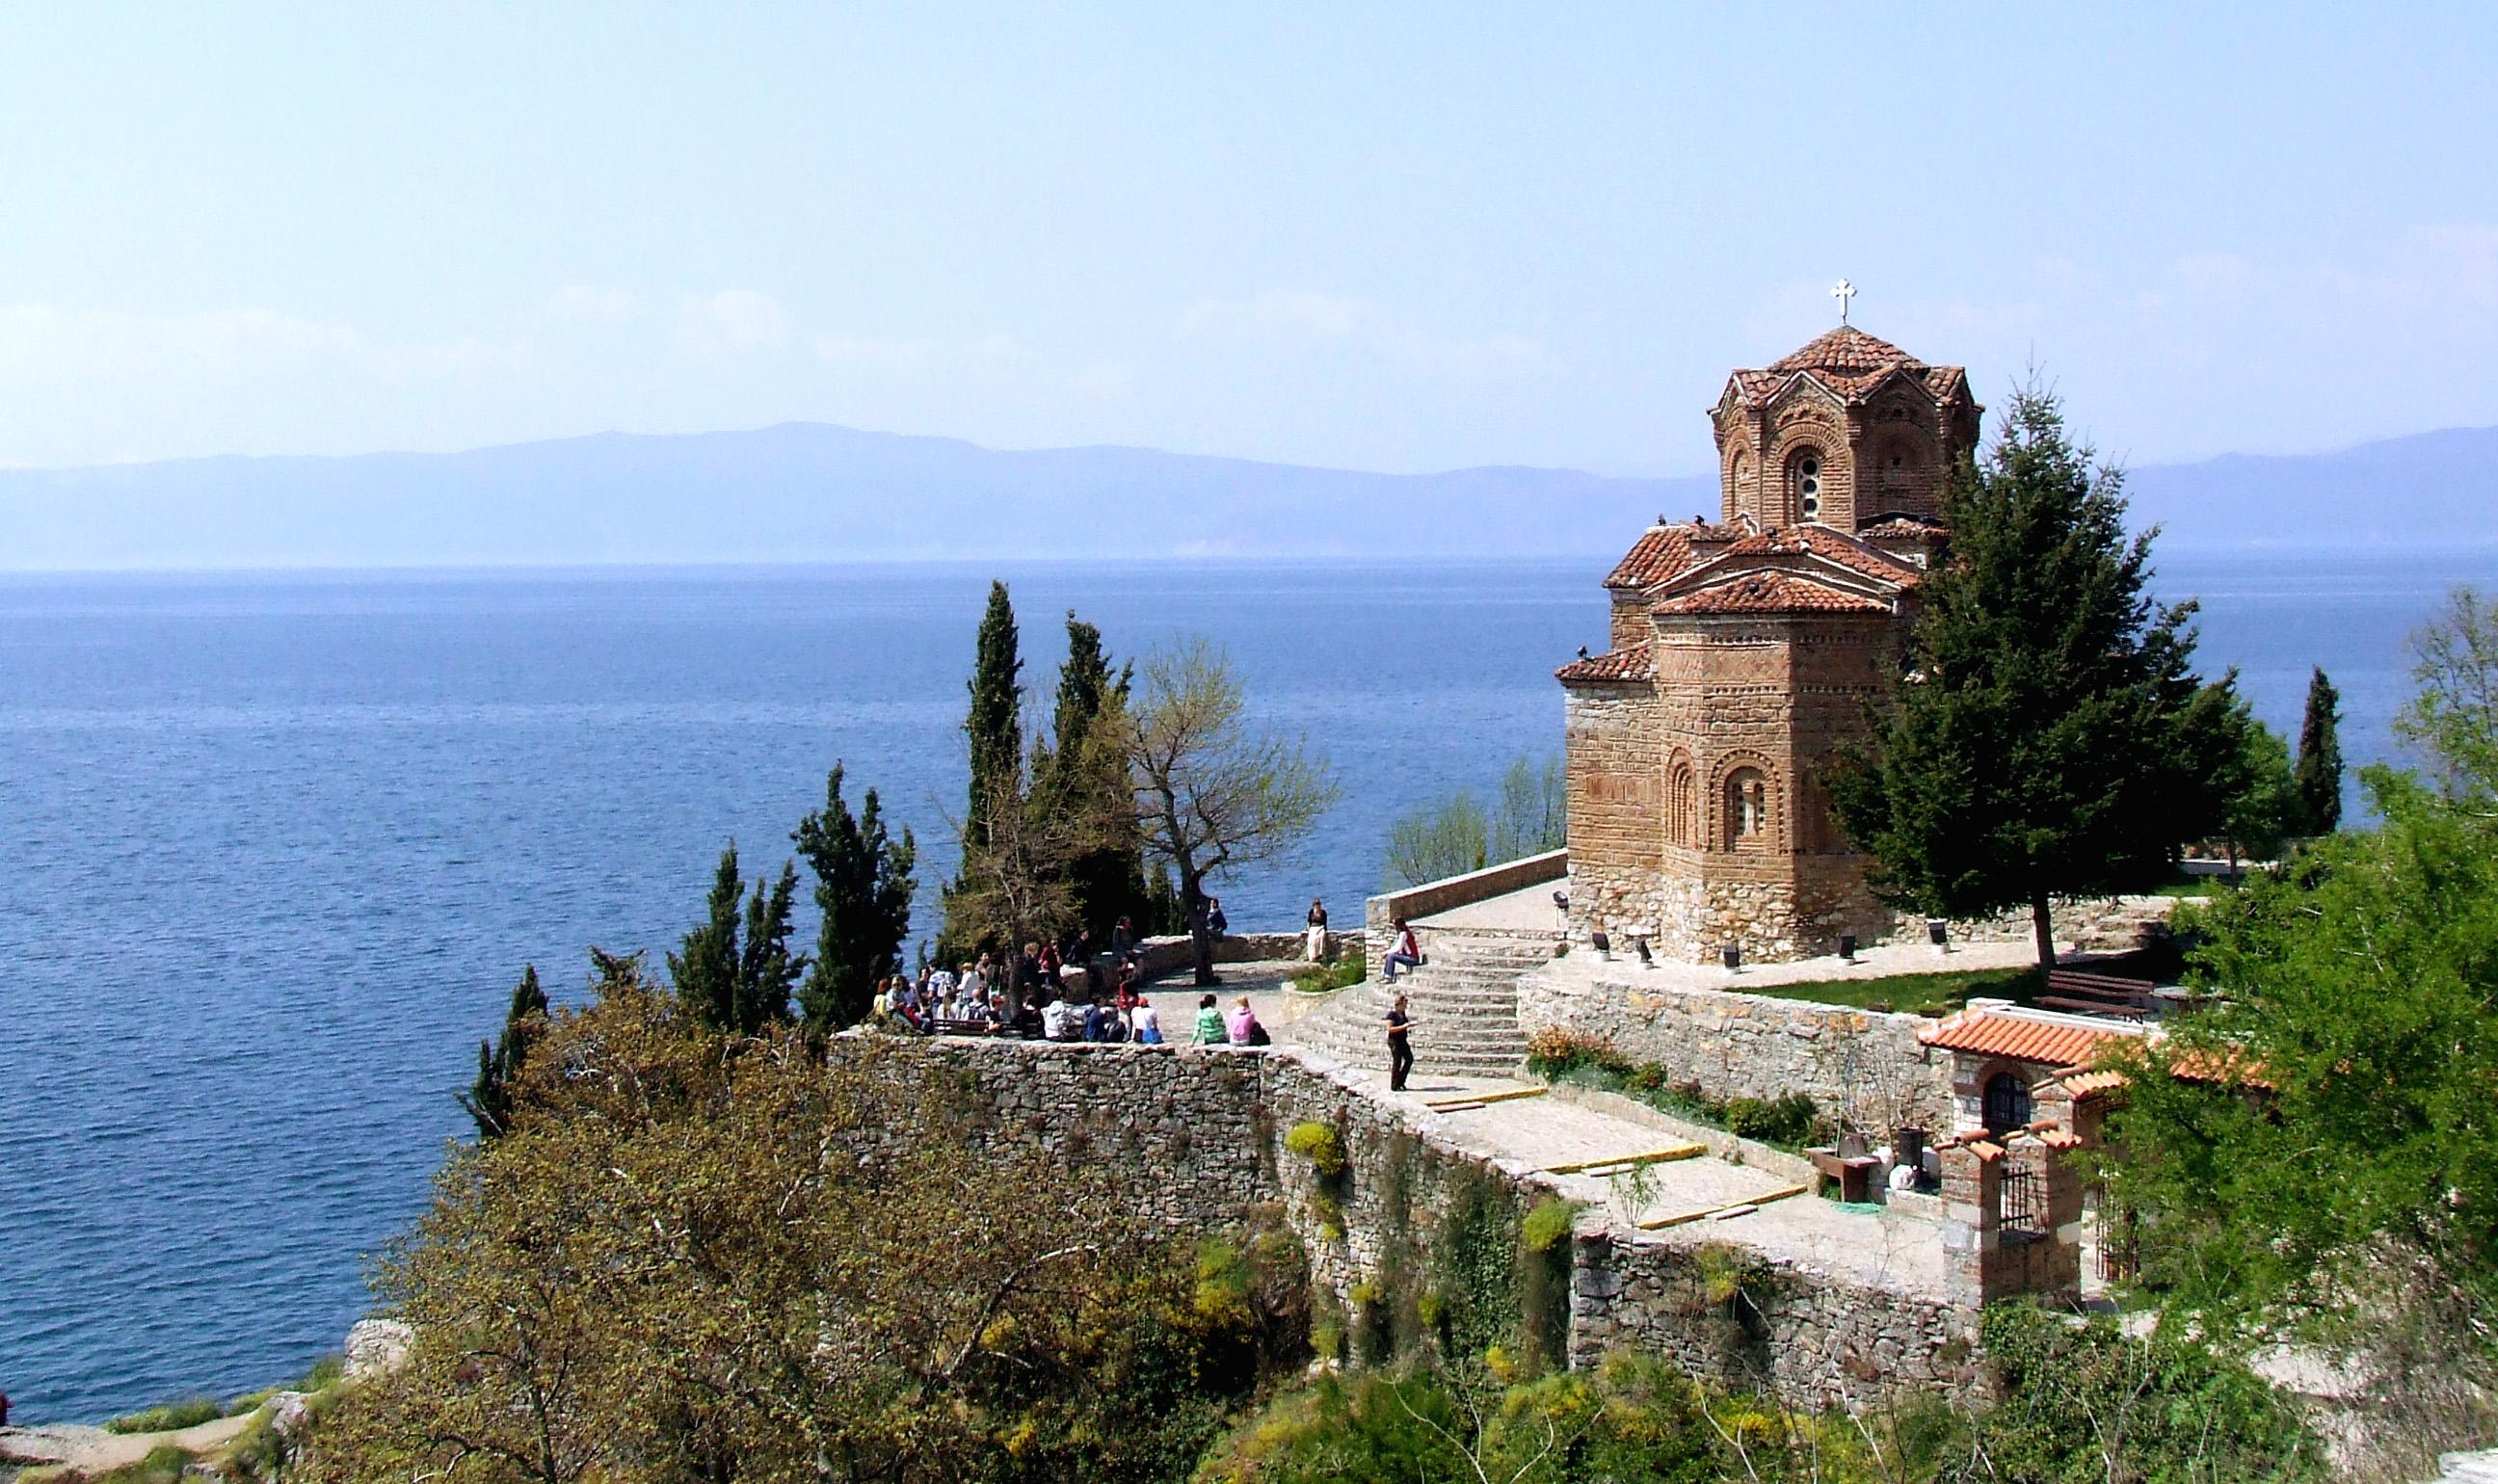 http://vodicimk.org.mk/wp-content/uploads/2017/12/Ohrid_Lake.jpg